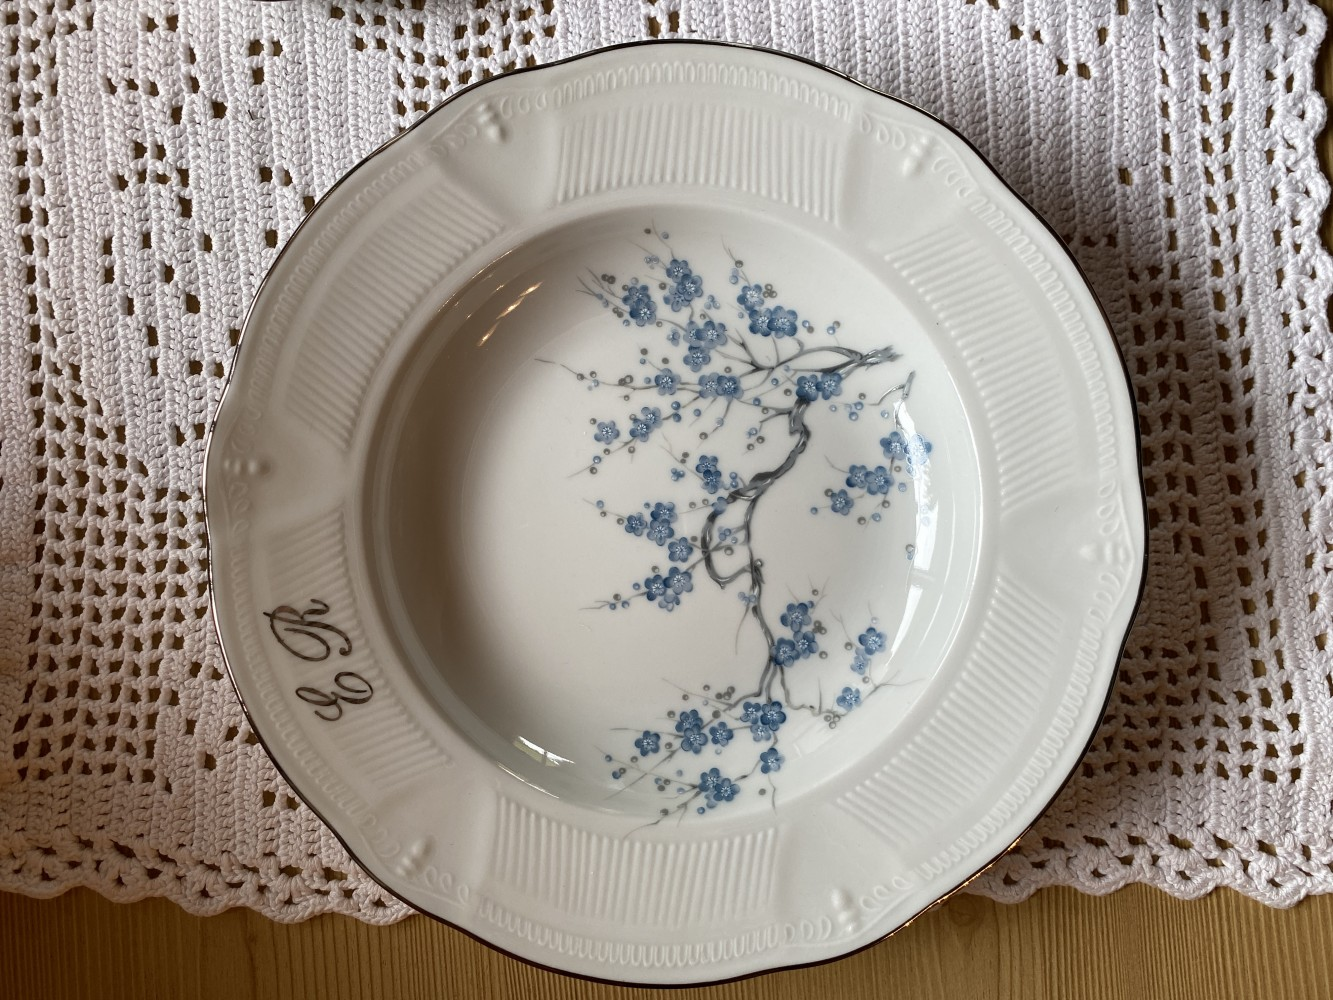 Geschirr - Porcelaine de Limoges France